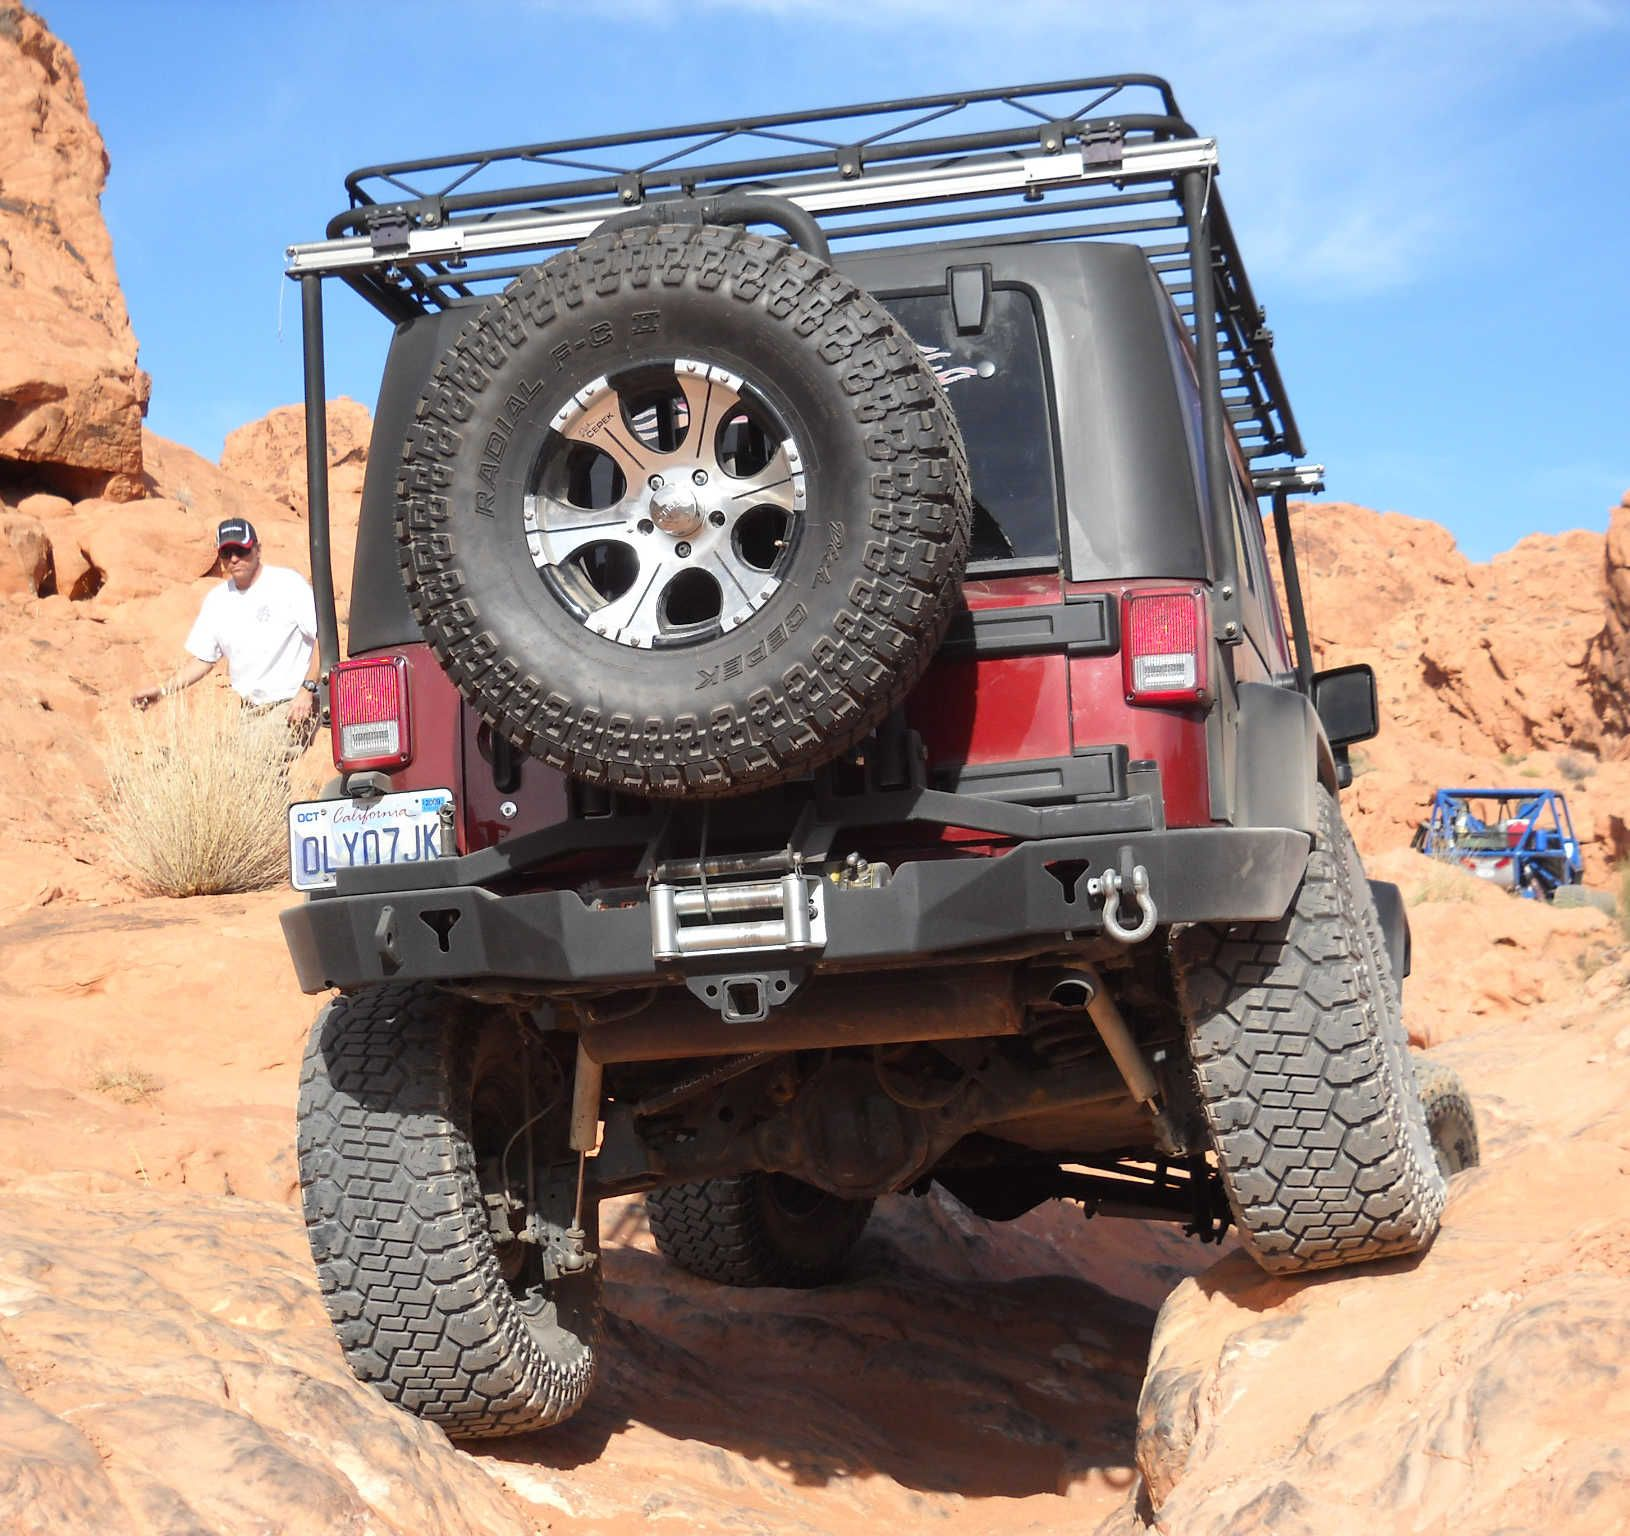 Commando Green Jeep New Hi Lift Jack Mounted Green Jeep